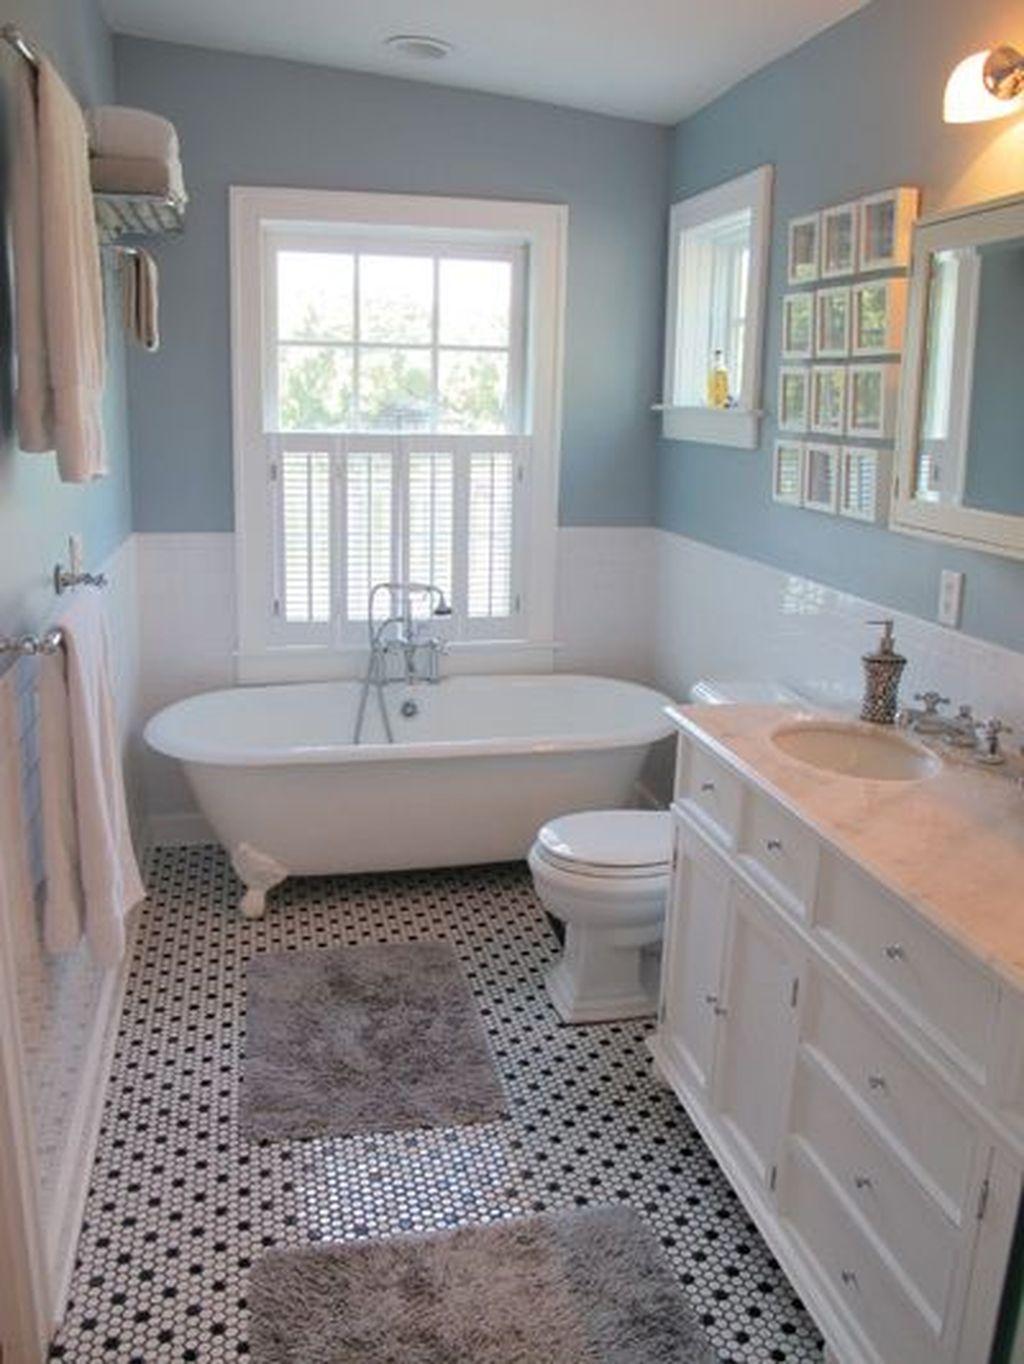 30 Amazing Cottage Bathroom Design Ideas Trenduhome Apartment Bathroom Small Bathroom Remodel Bathroom Design